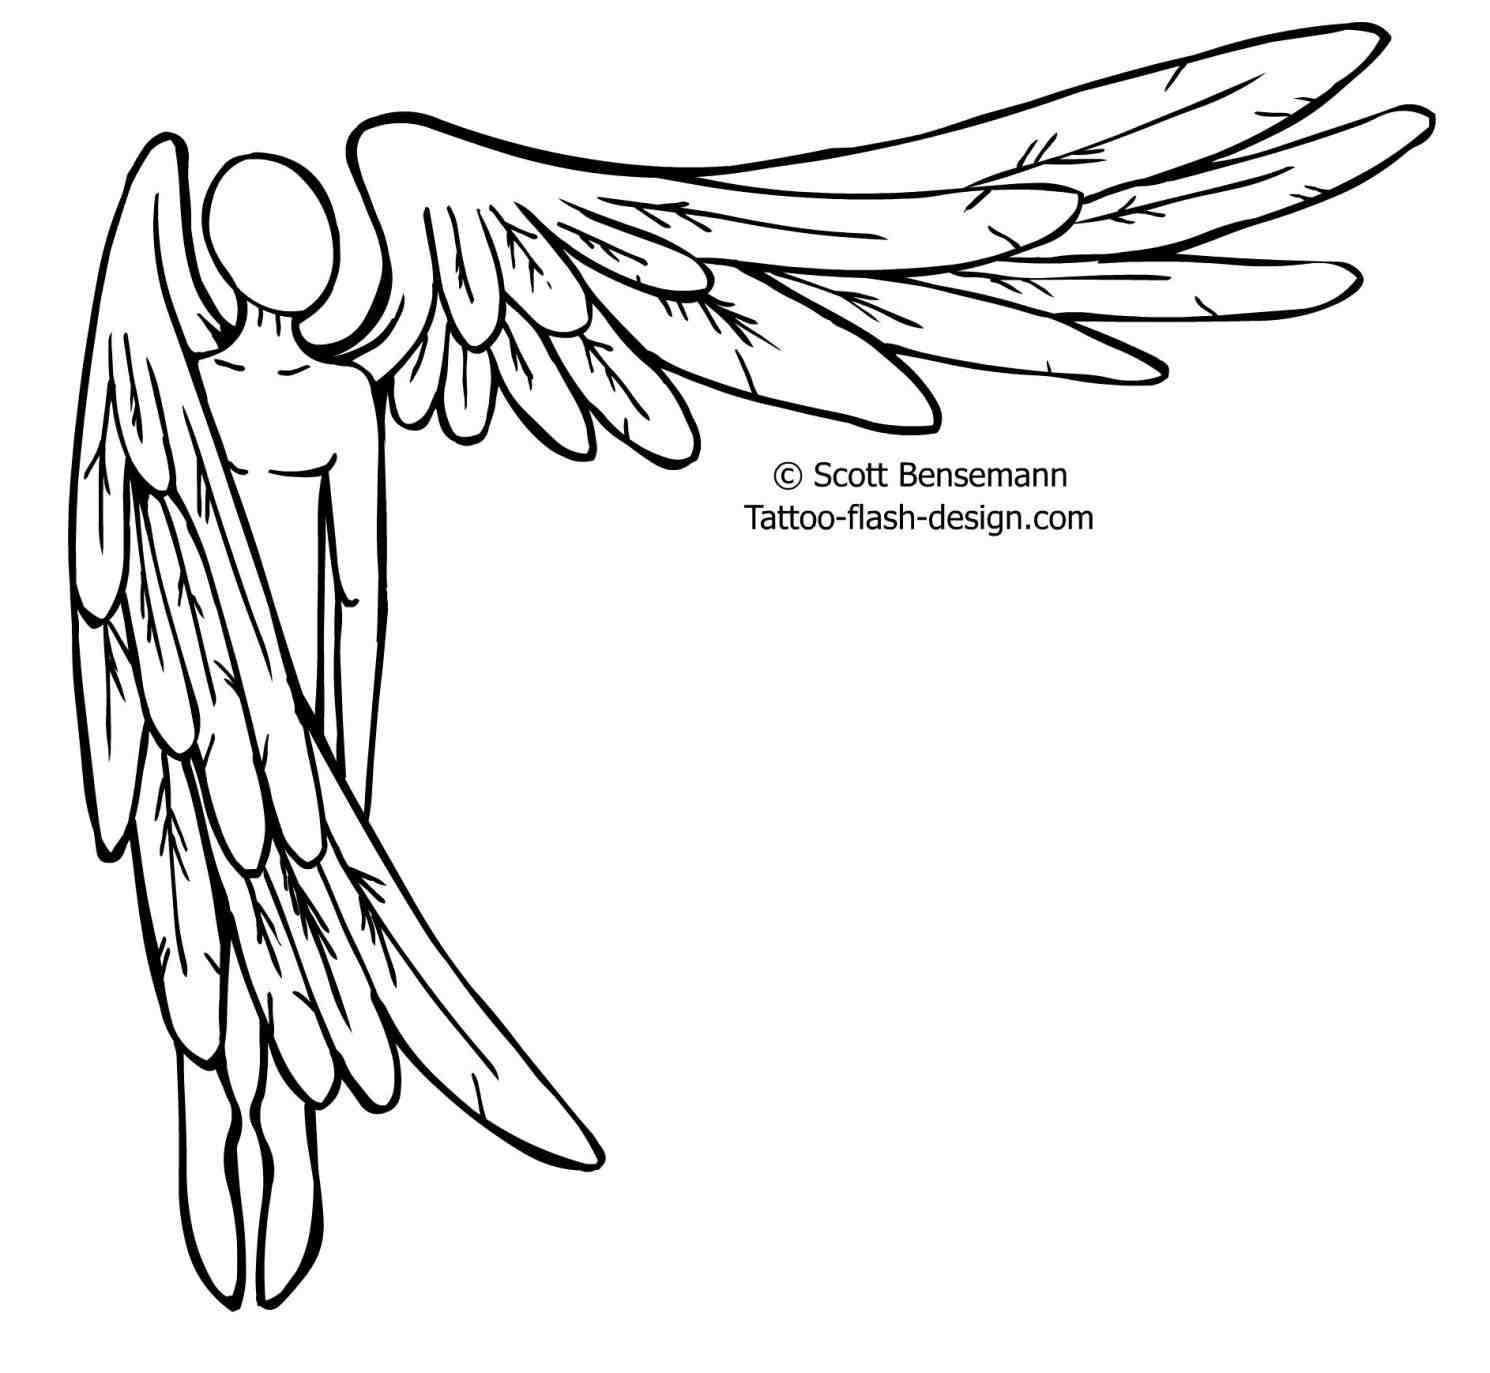 Drawings Of Crosses With Wings